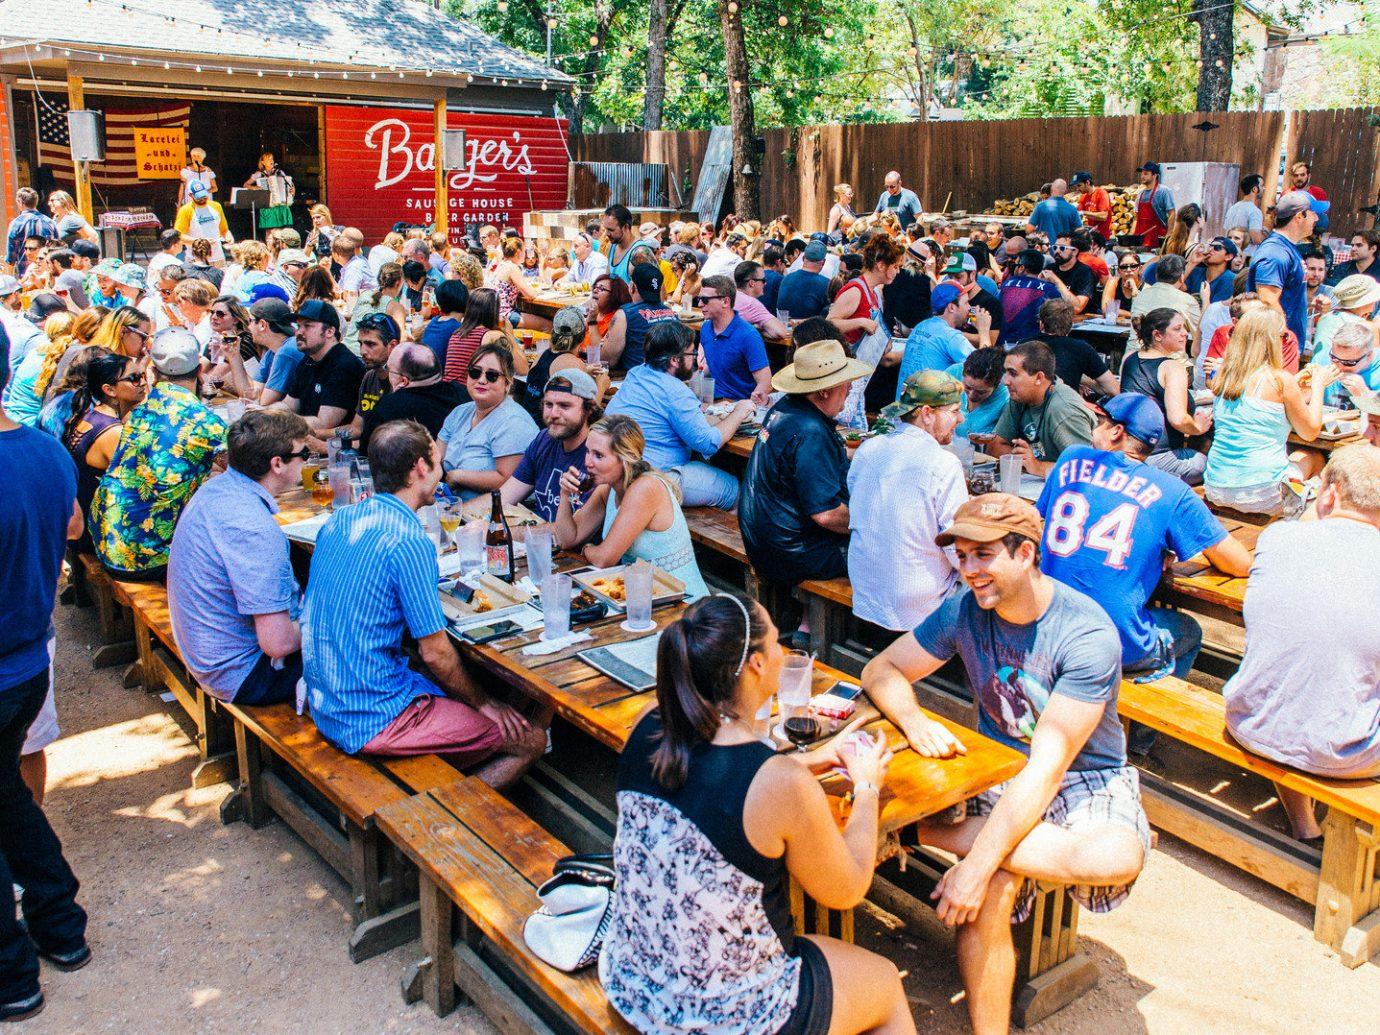 Austin beer garden crowd Food + Drink Girls Getaways outdoor dining Patio people Terrace Texas Trip Ideas Weekend Getaways person social group outdoor scene group youth community